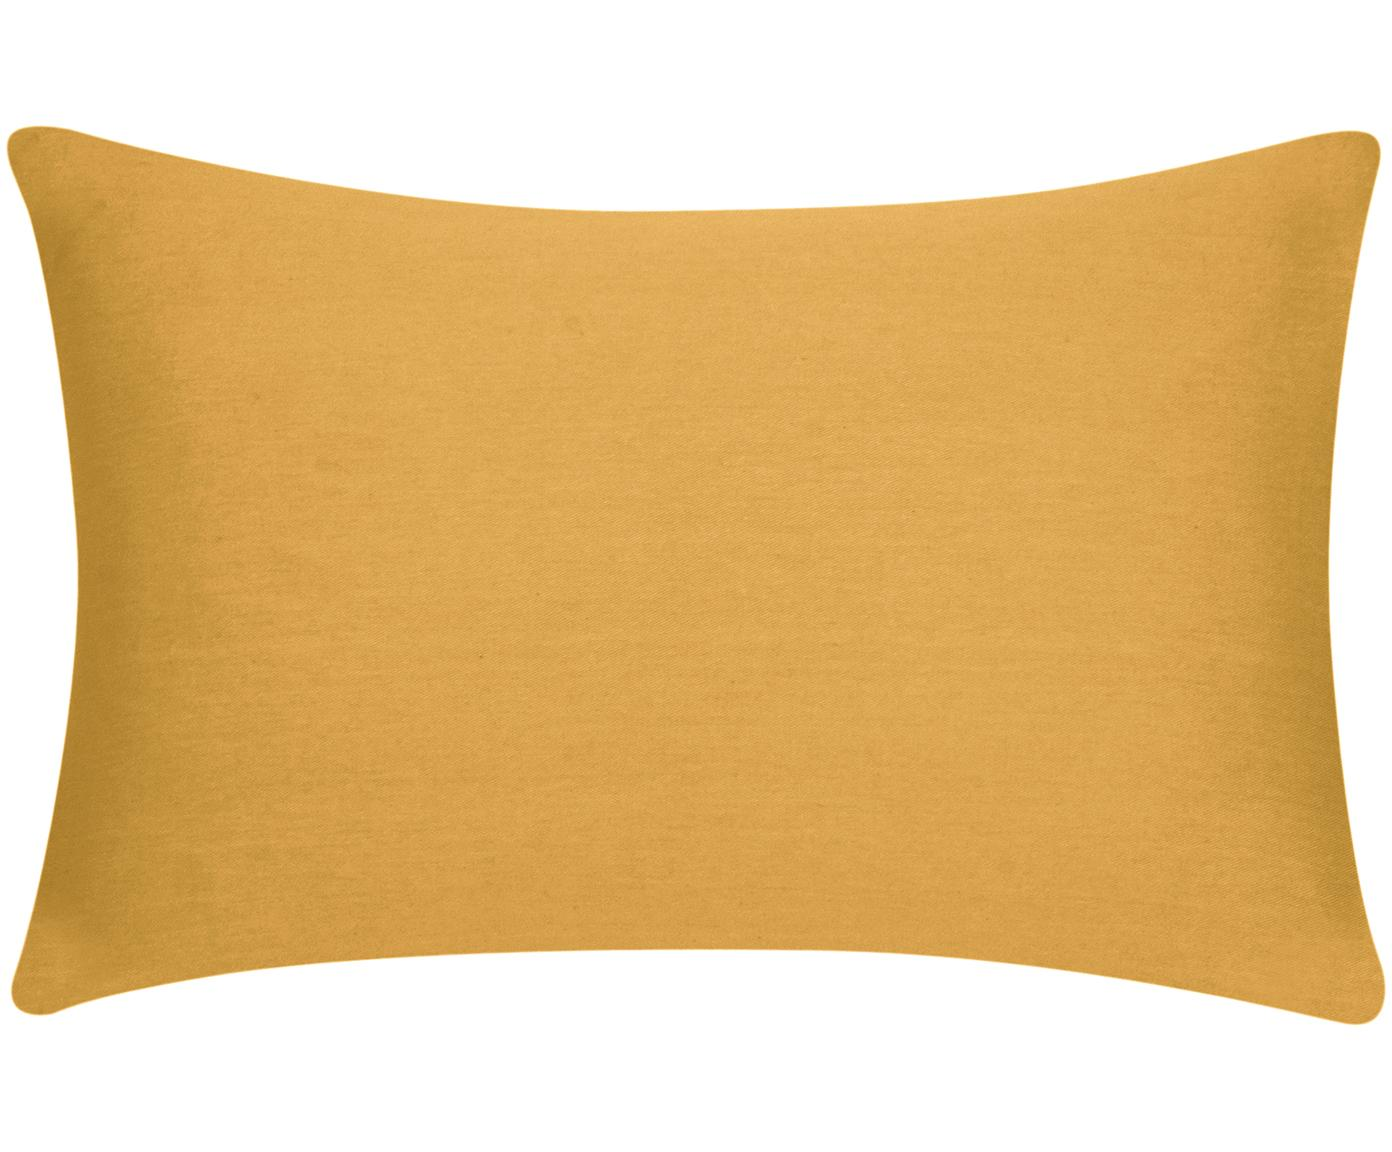 Kussenhoes Mads, 100% katoen, Mosterdgeel, 30 x 50 cm